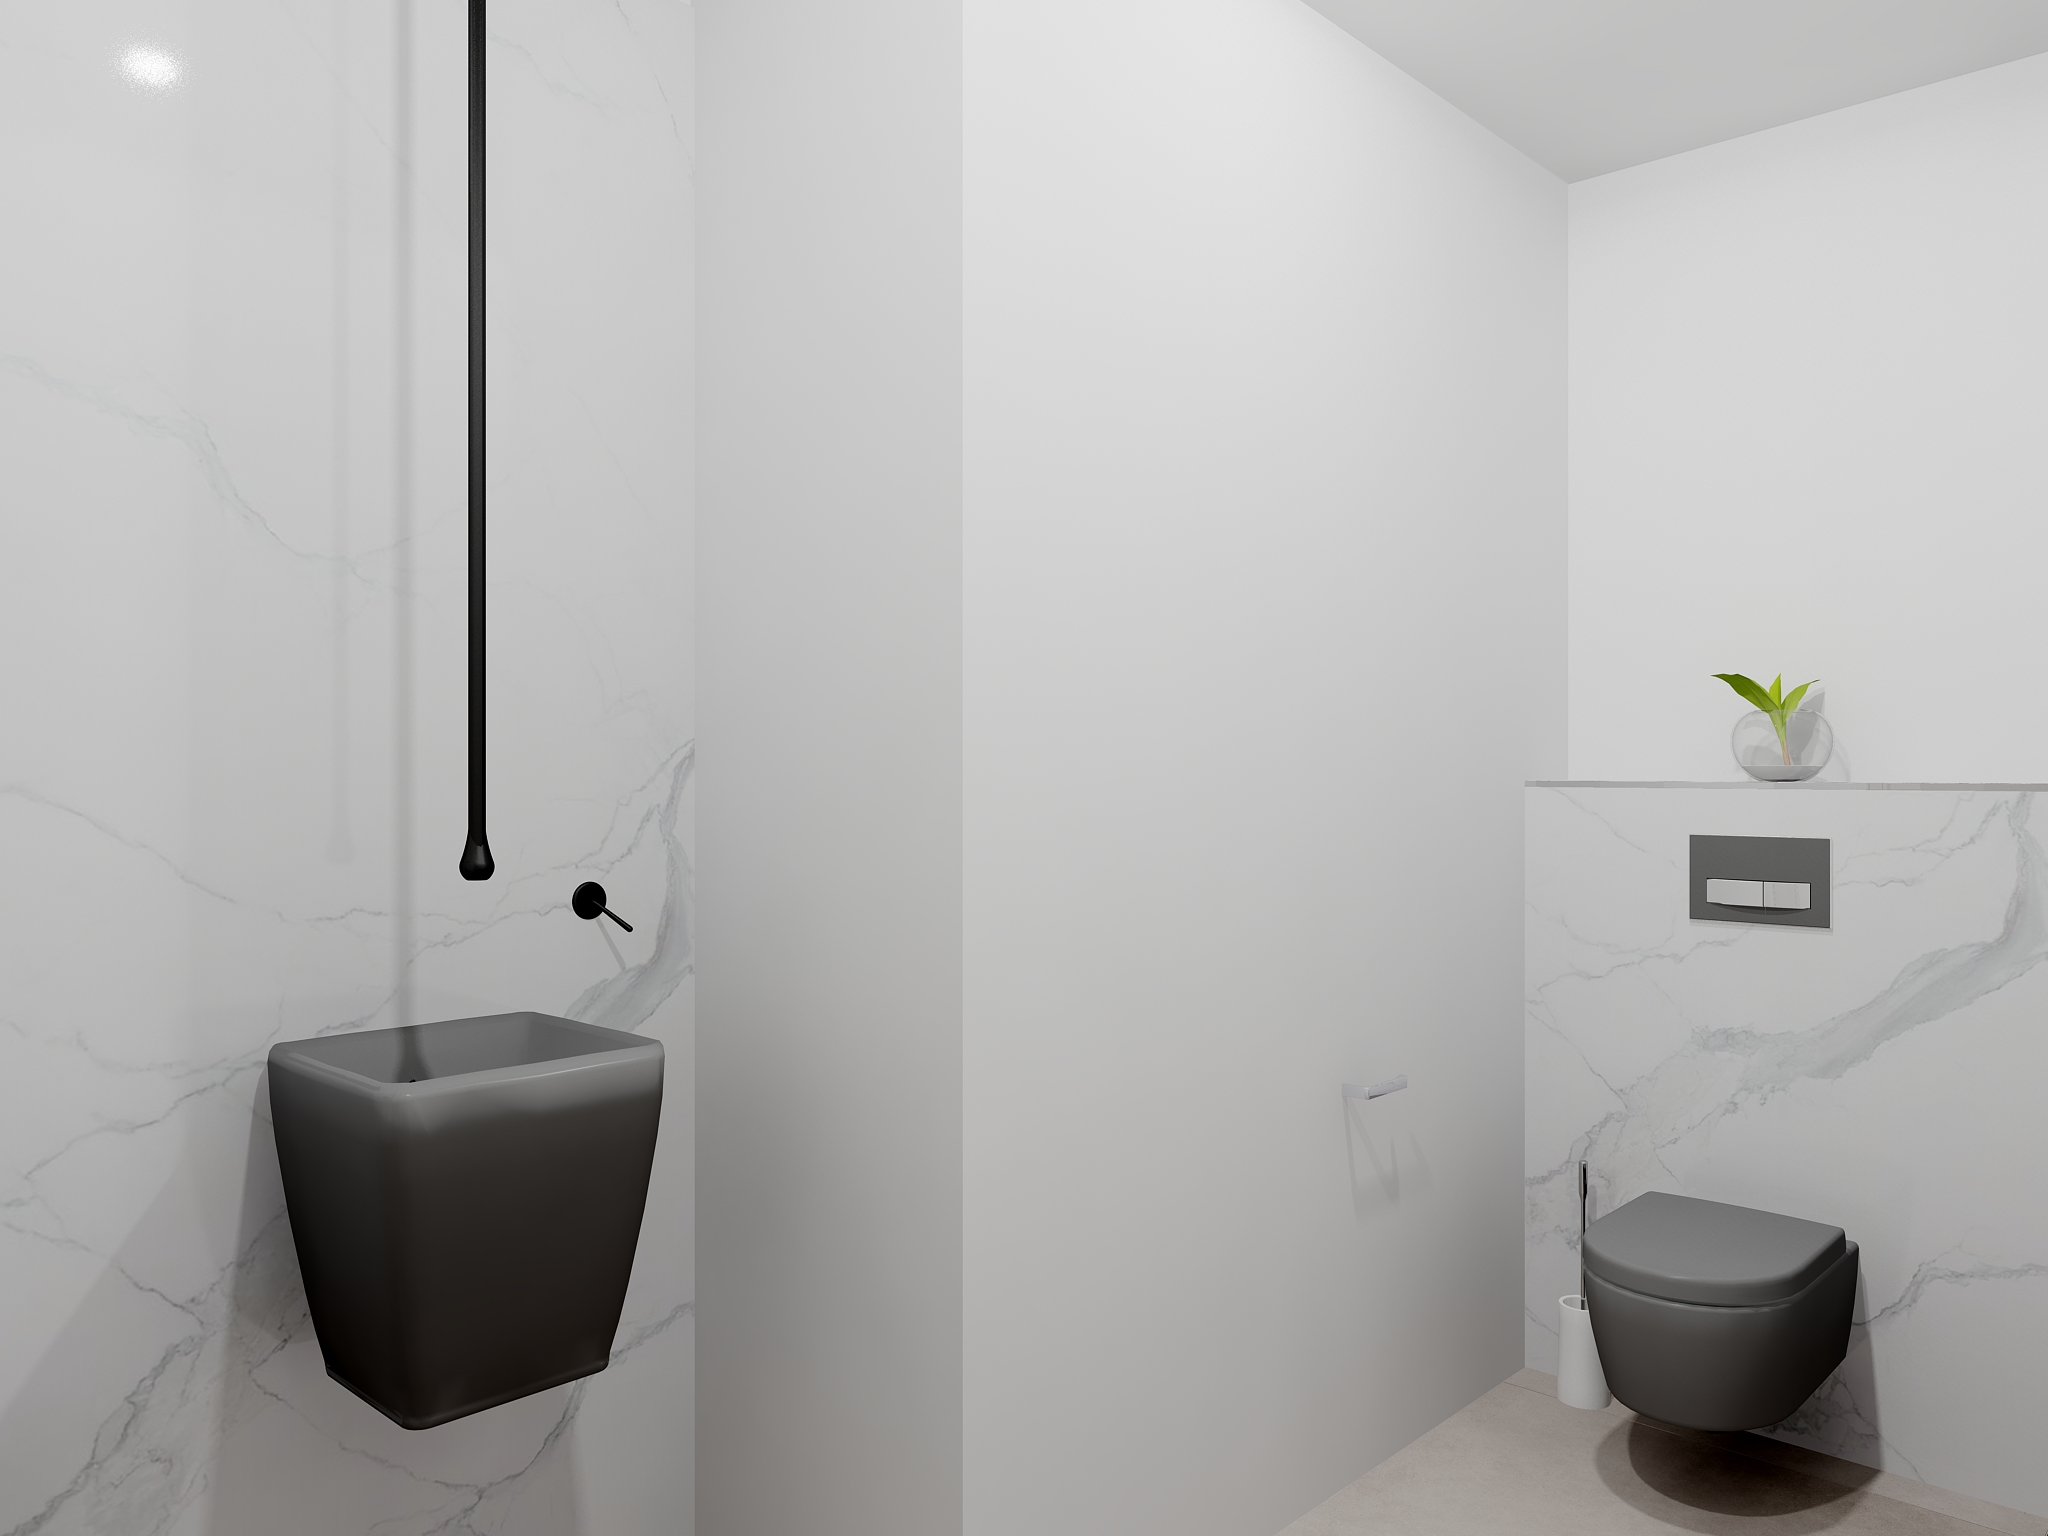 Mattout Carrelage WC INVITES V1 2 Bathroom By Mattout ...